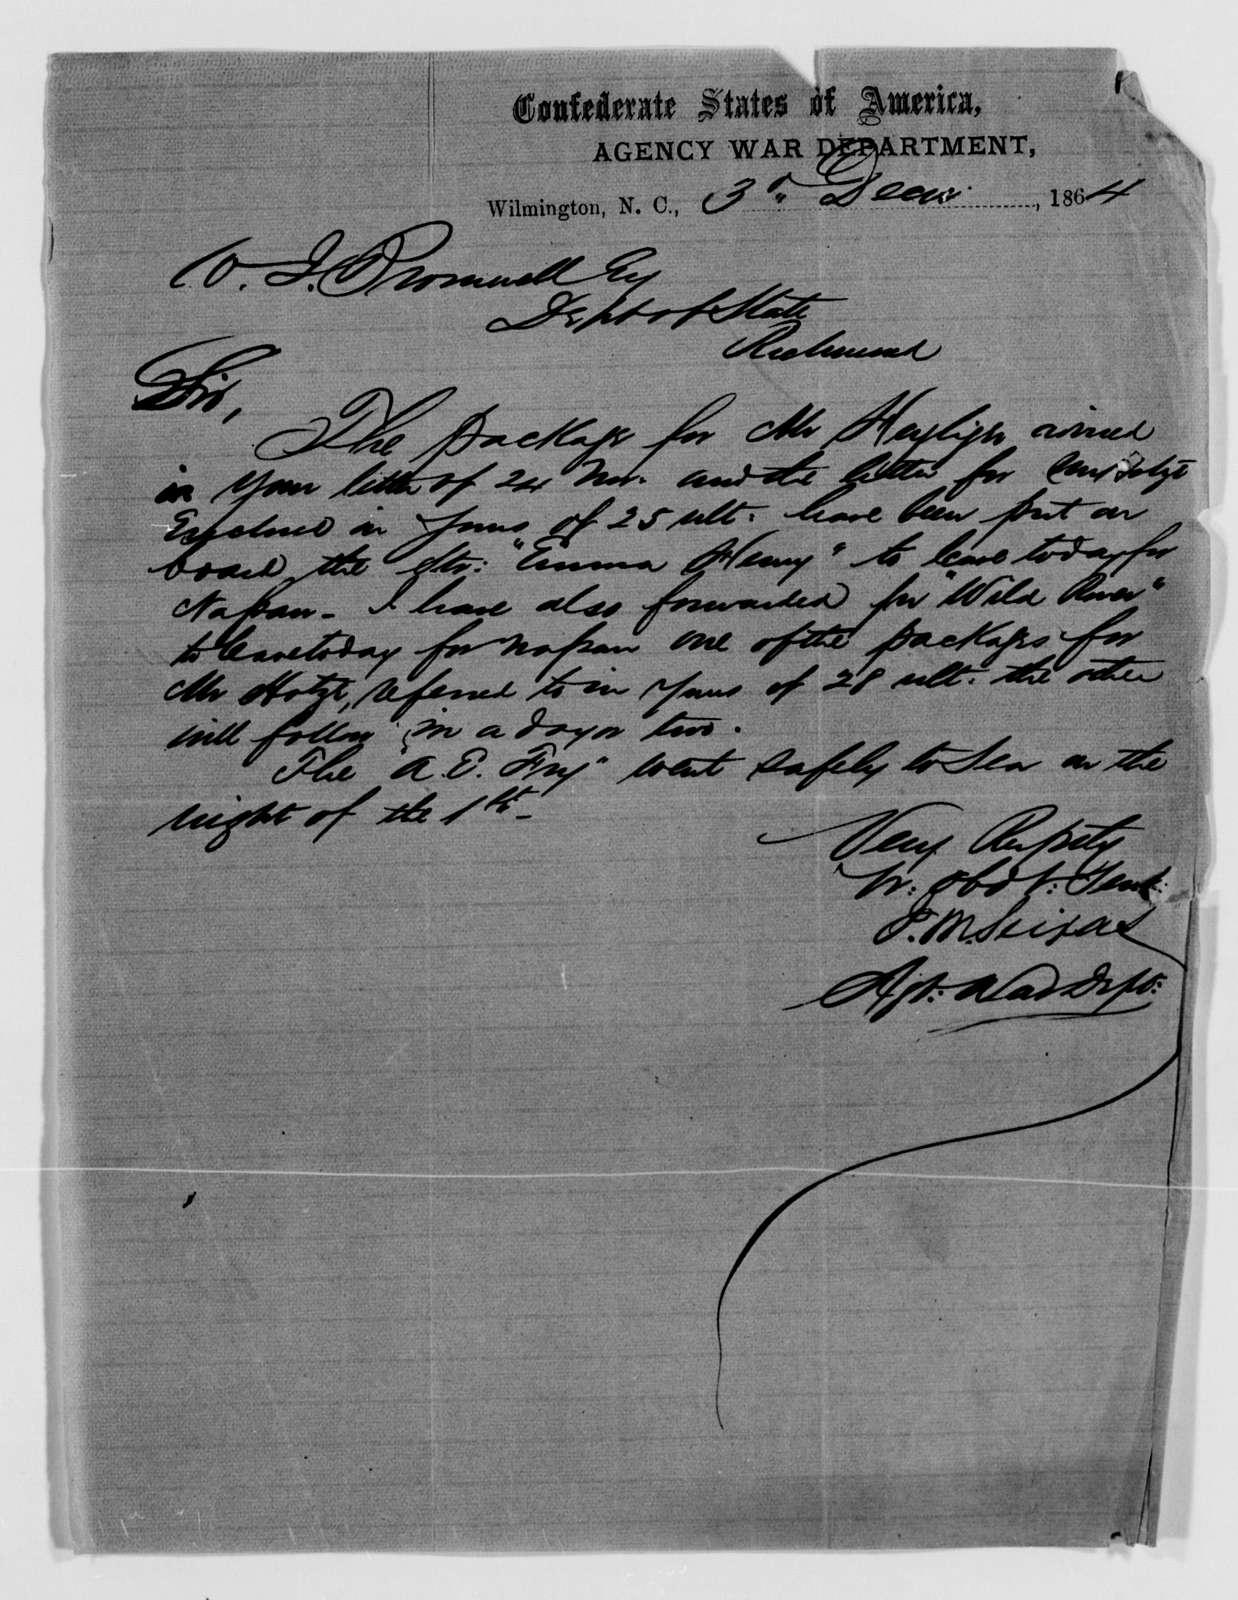 Confederate States of America records: Microfilm Reel 15